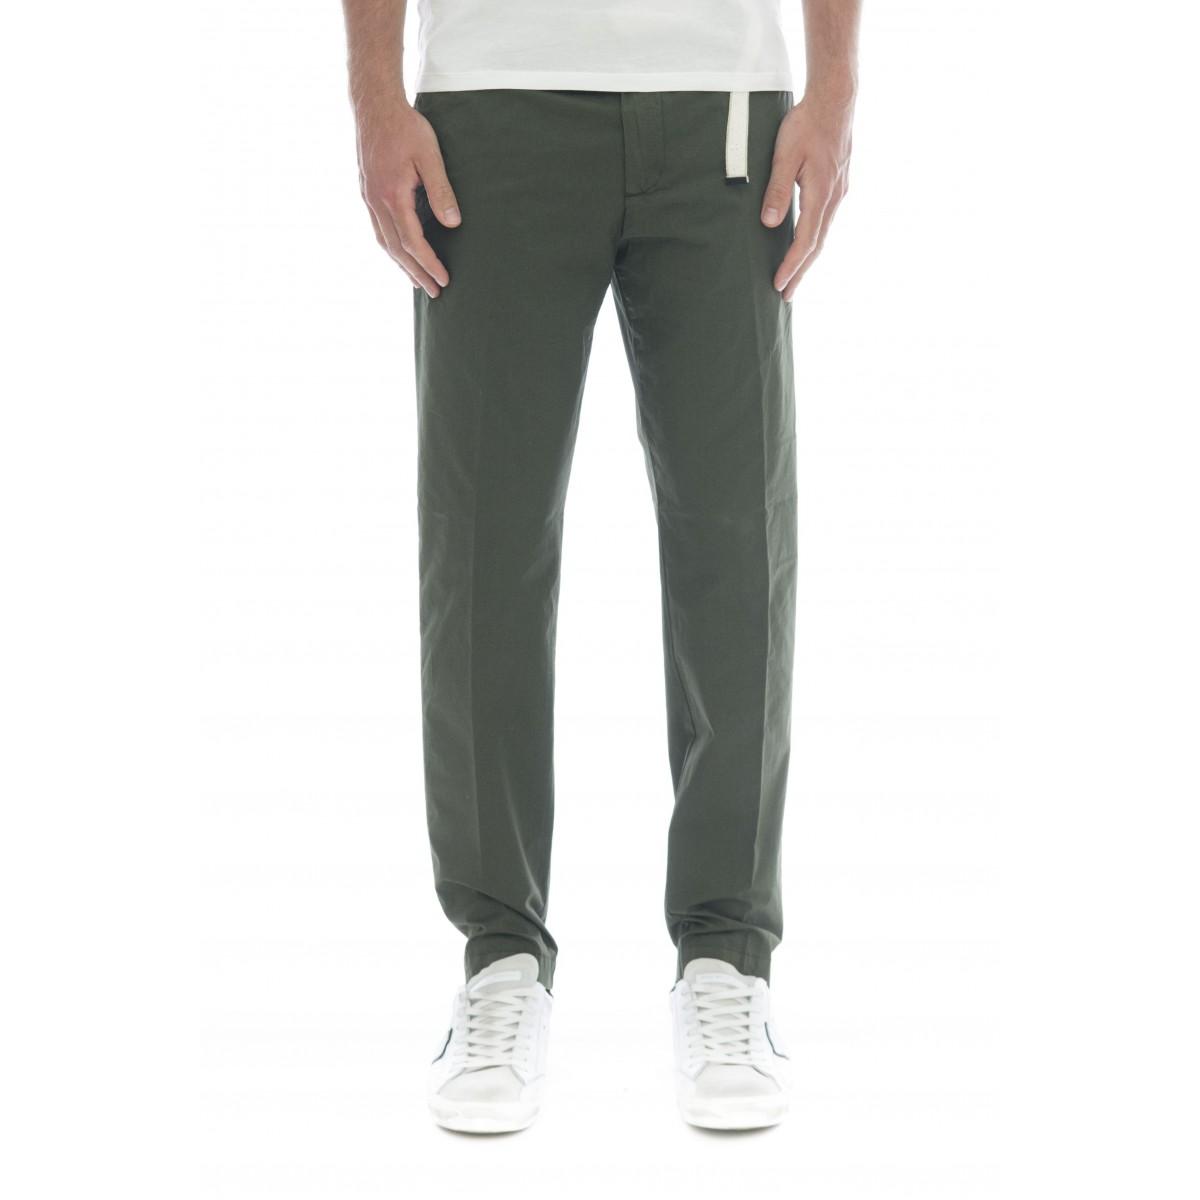 Pantalone uomo - 16l 17 pant elastico tela paracadute light